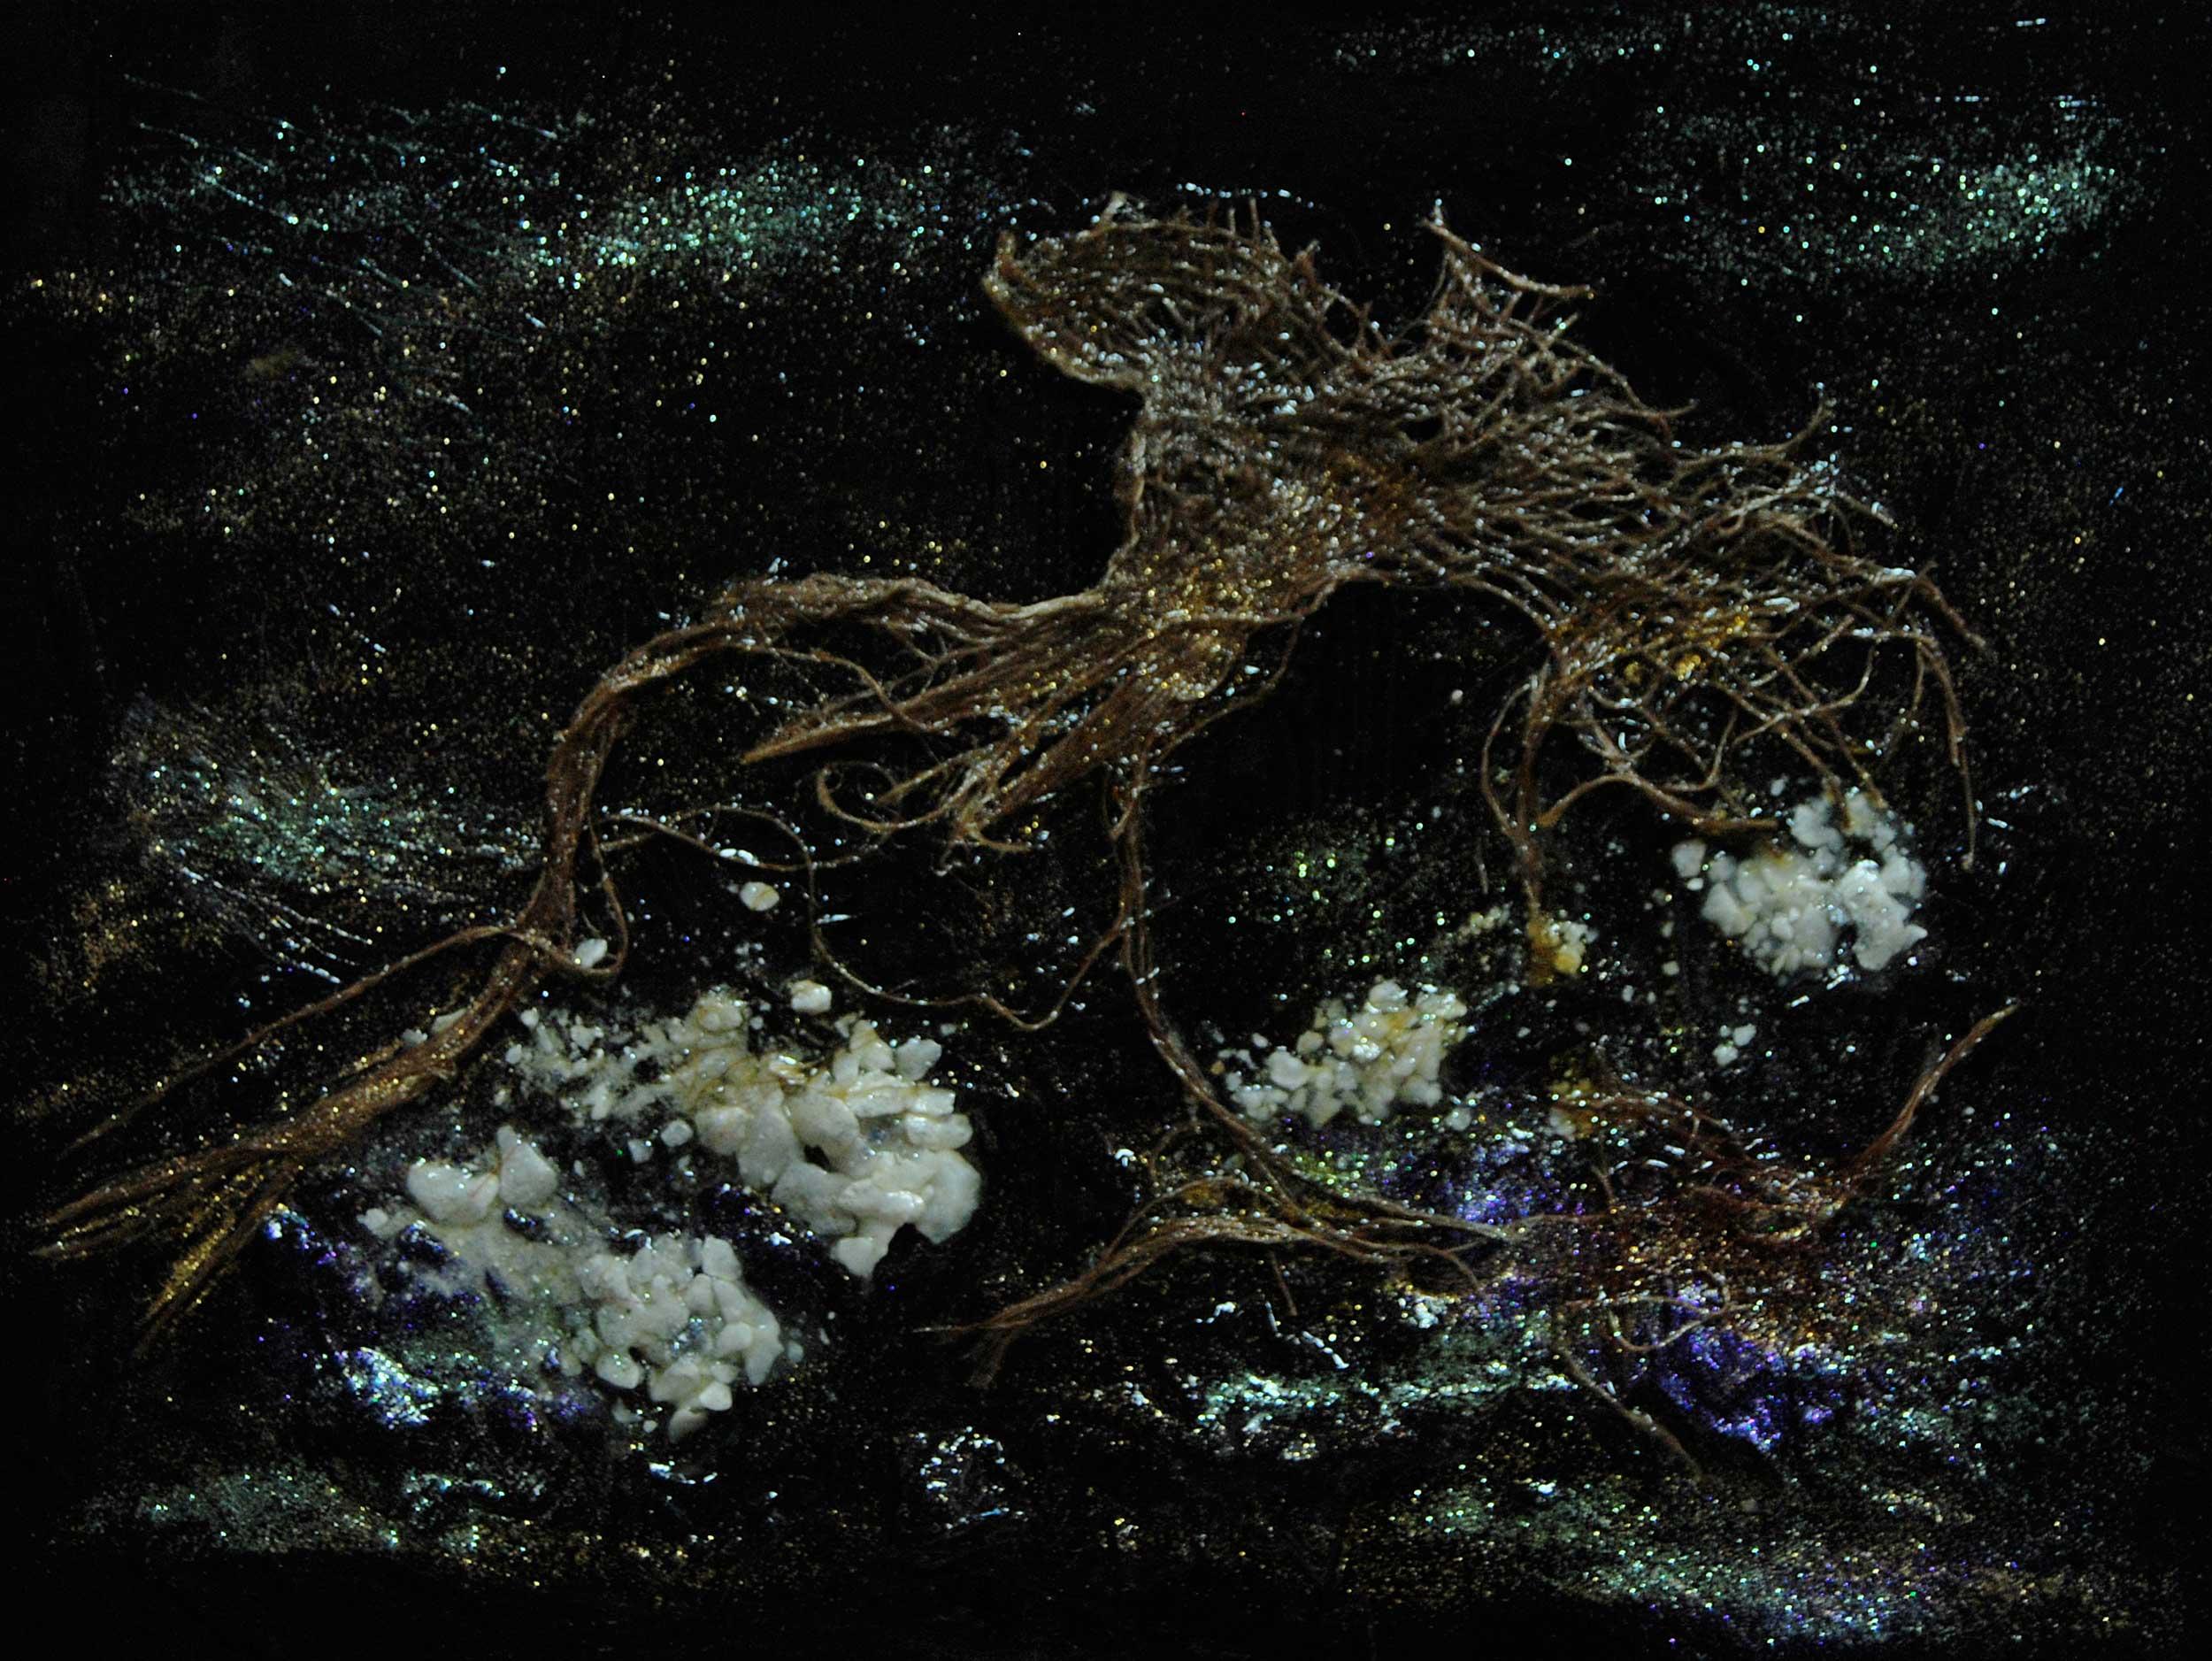 Yoshiko_Ikeda_04_Cambrian-Explosion-Ⅲ-Melesio_2011_12x16_Mix-media-Sm.jpg